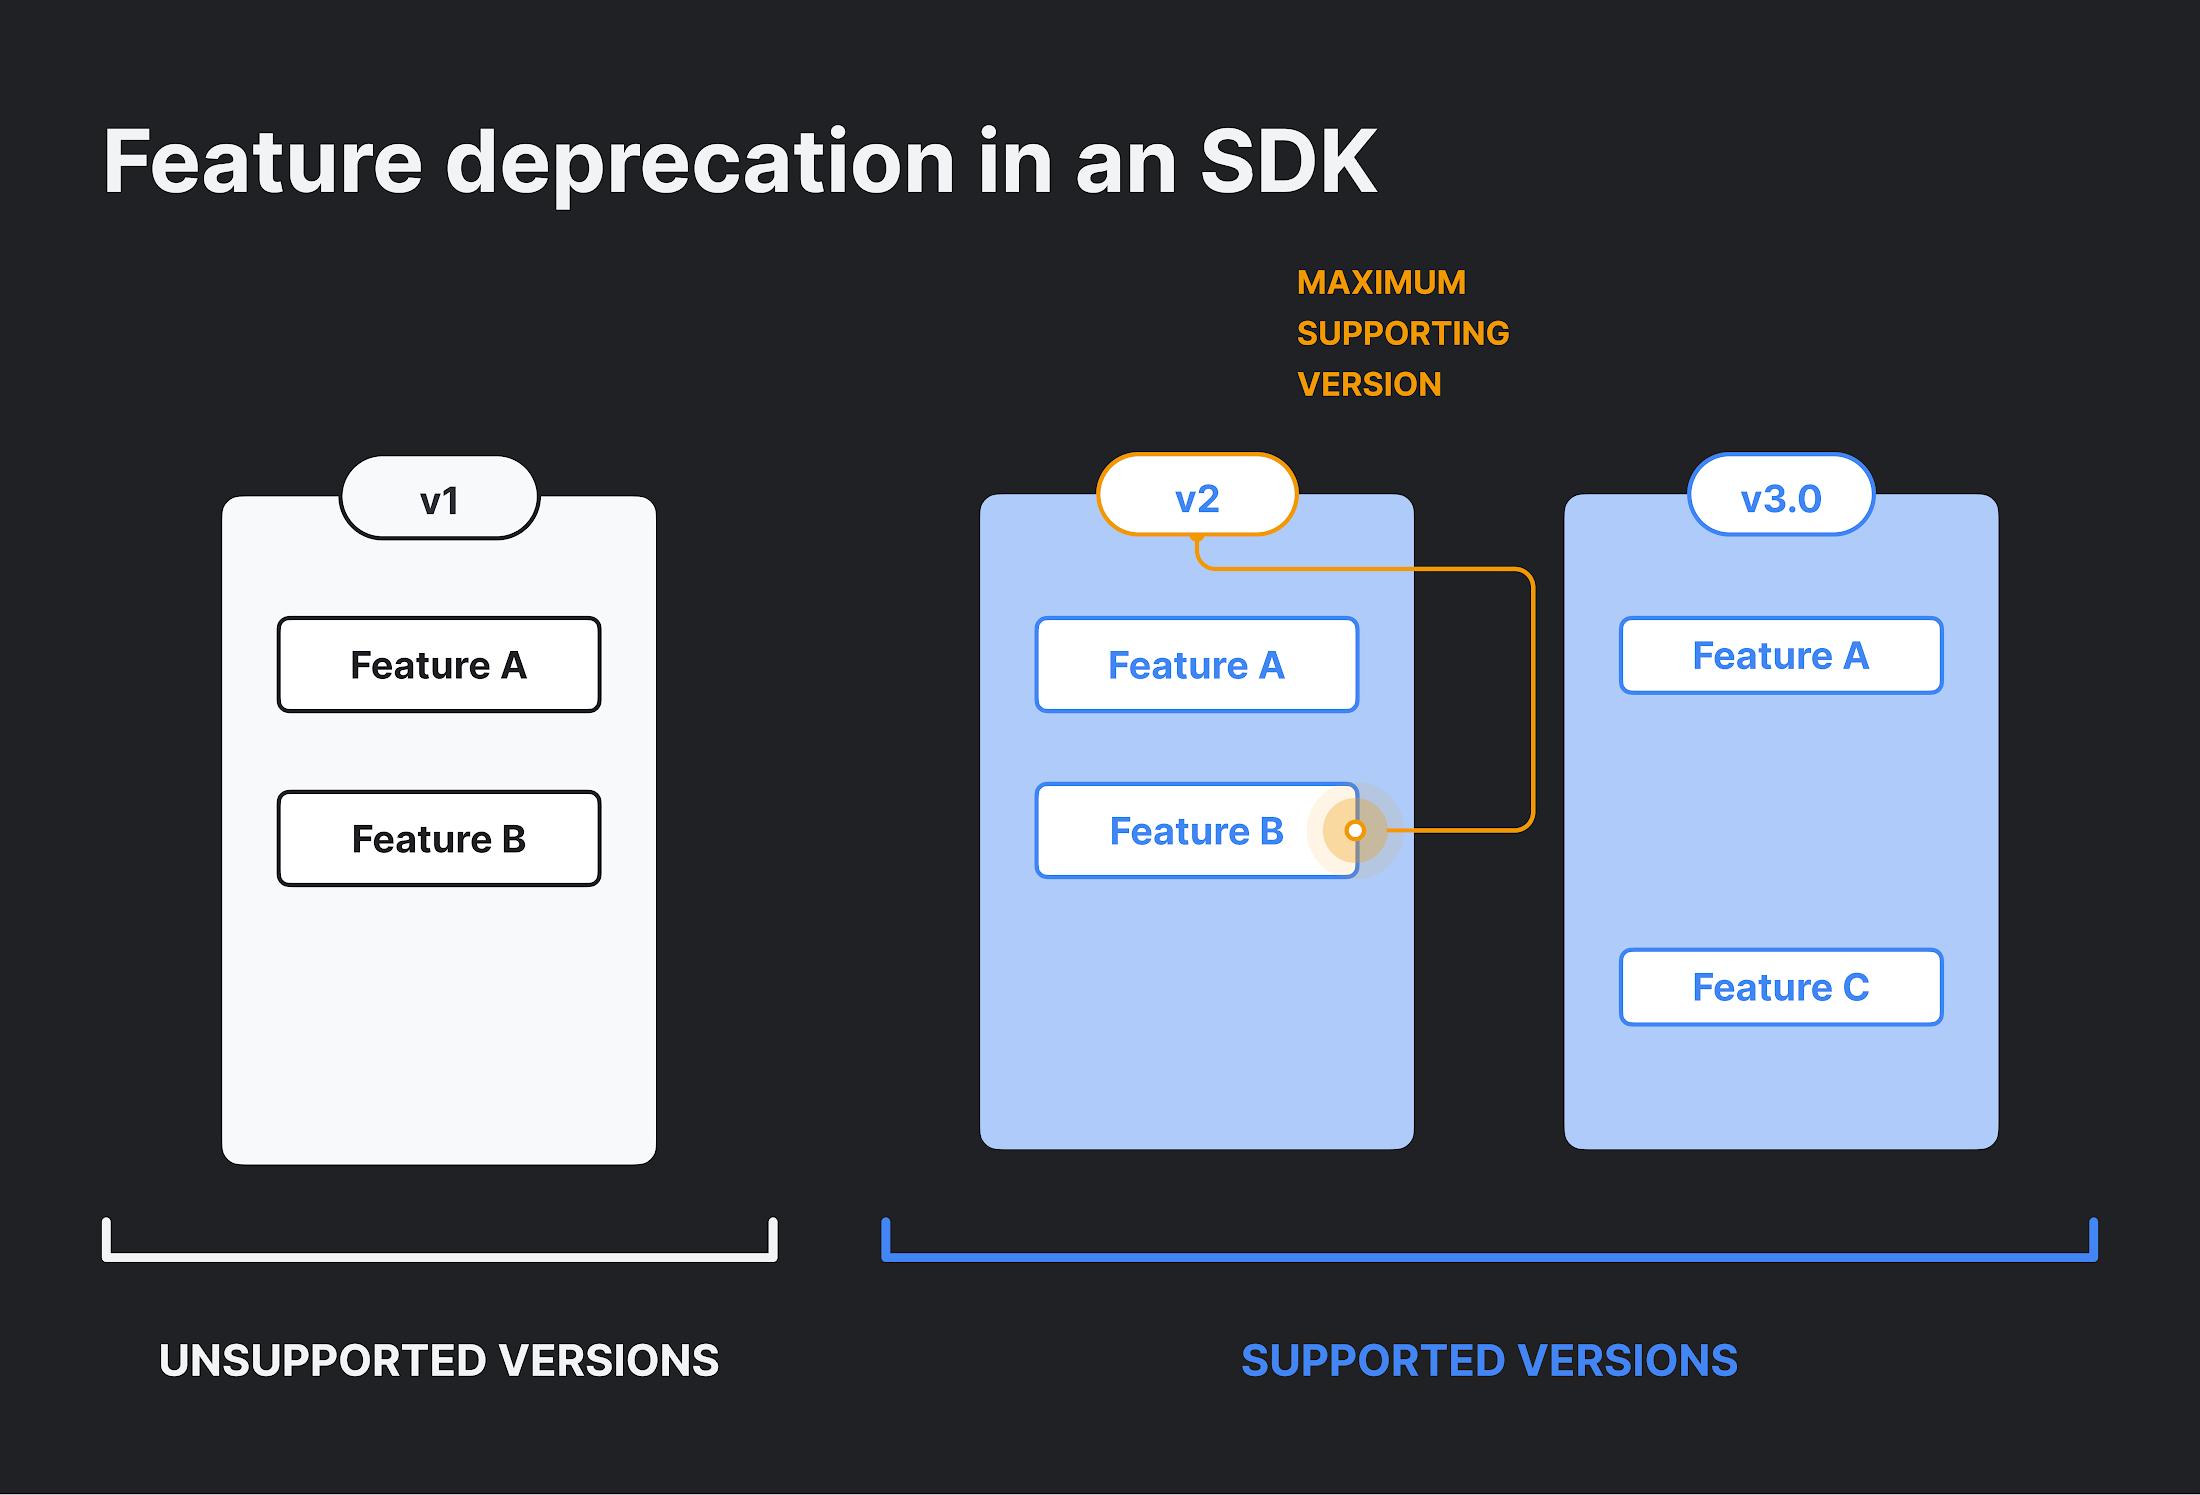 SDK Feature Deprecation